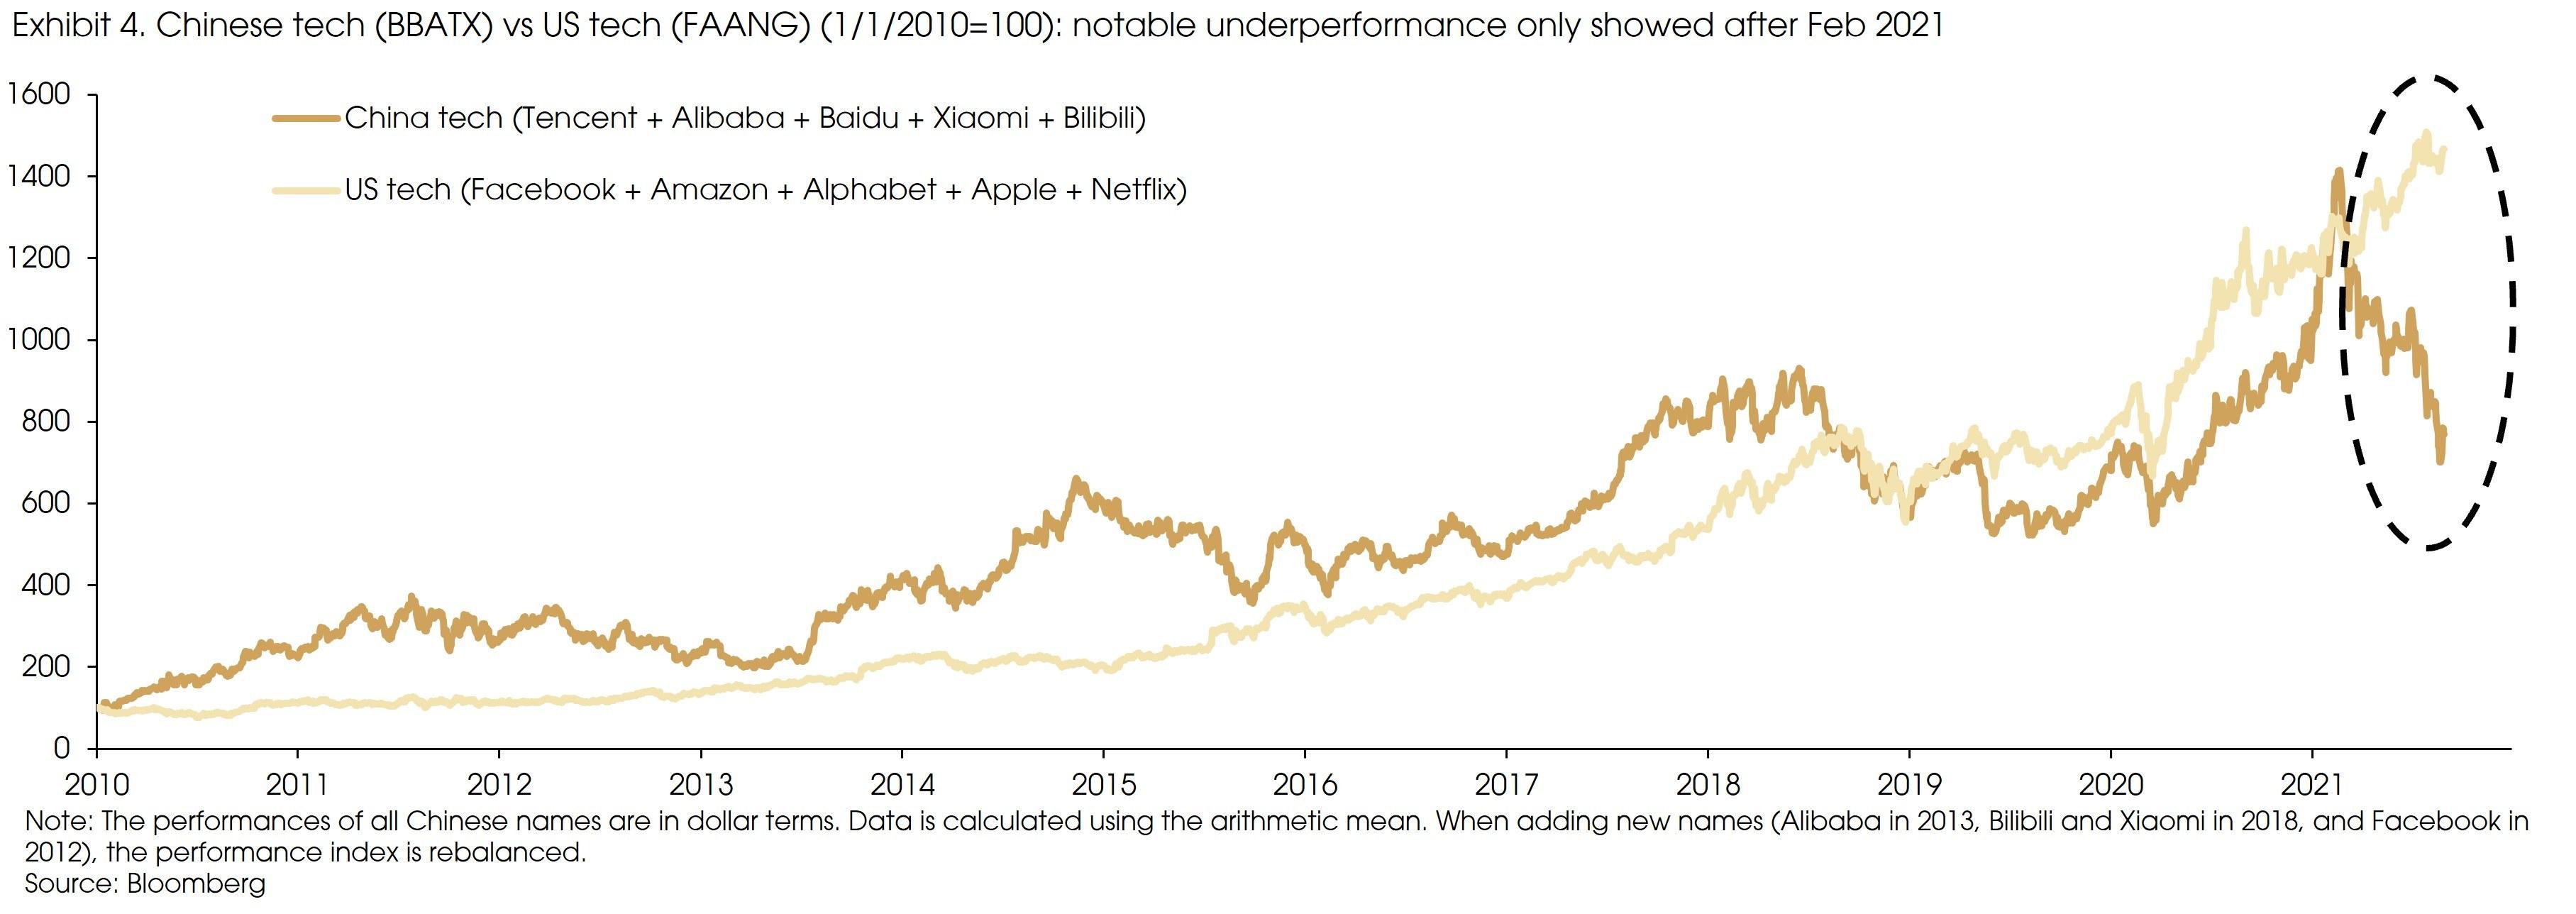 Exhibit 4 Chinese tech vs US tech performance